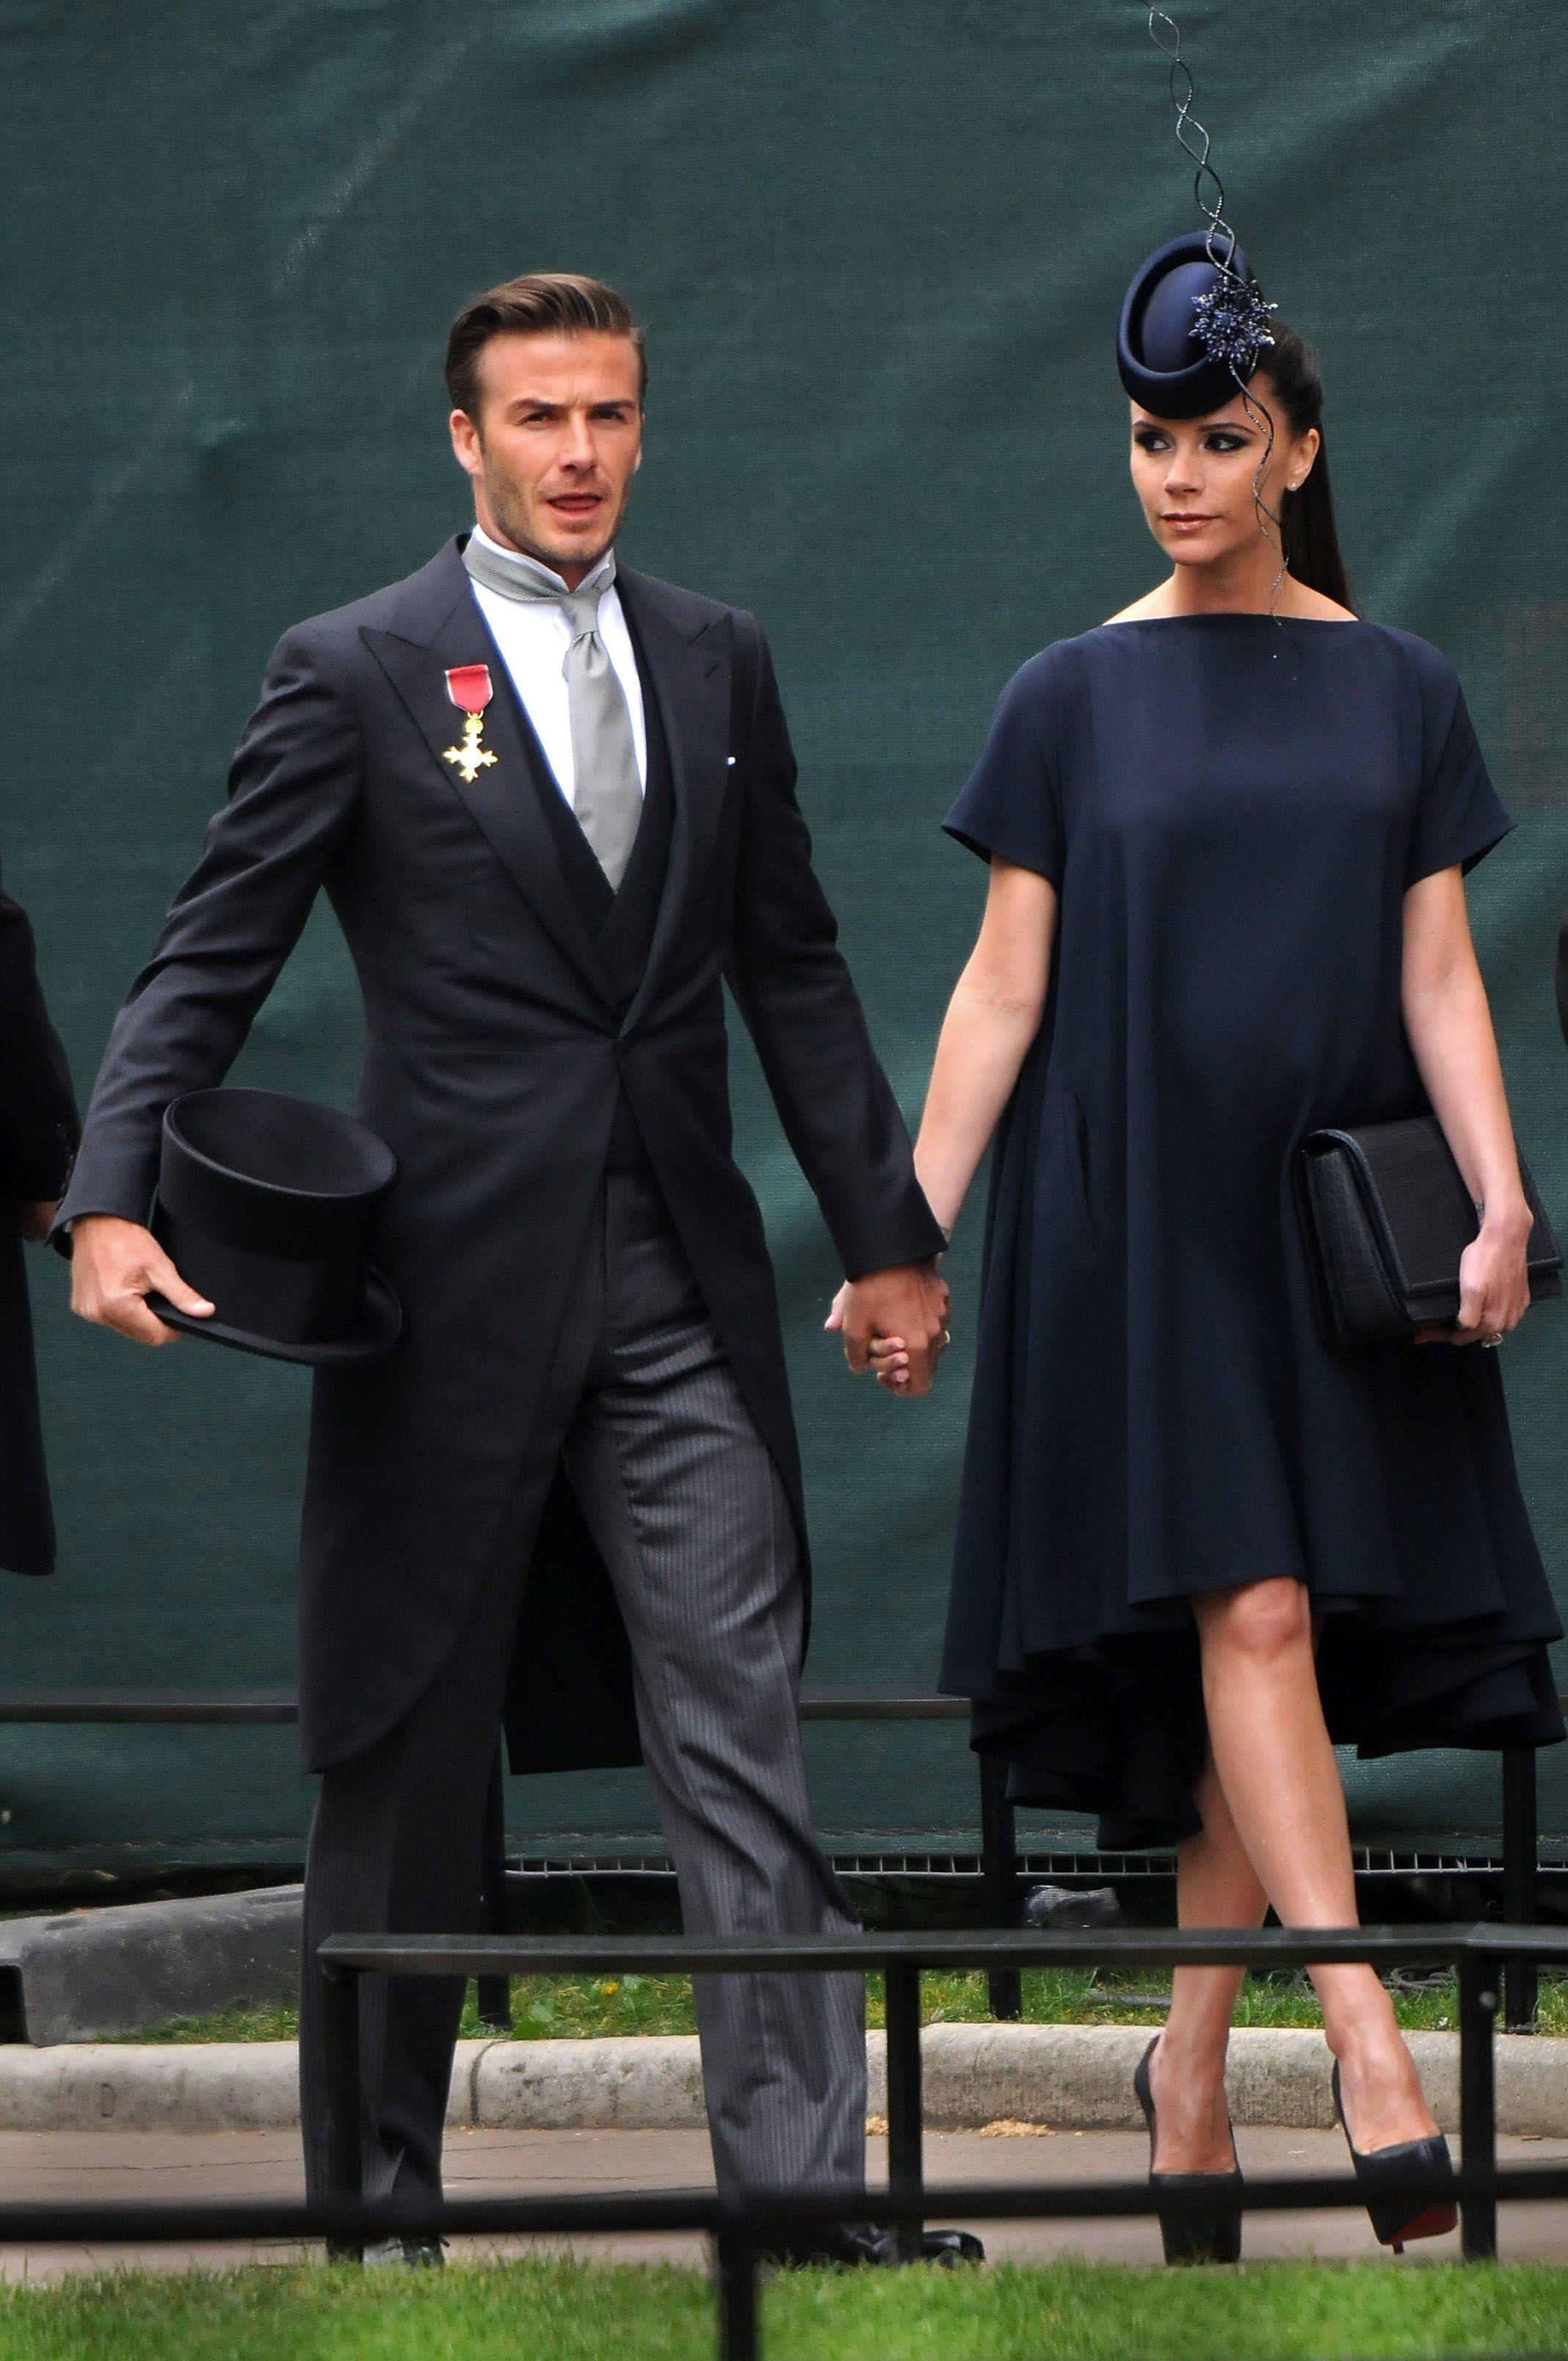 Decoding The Royal Wedding Dress Code Victoria Beckham Style Royal Wedding Guests Outfits Royal Wedding Dress [ 3216 x 2136 Pixel ]